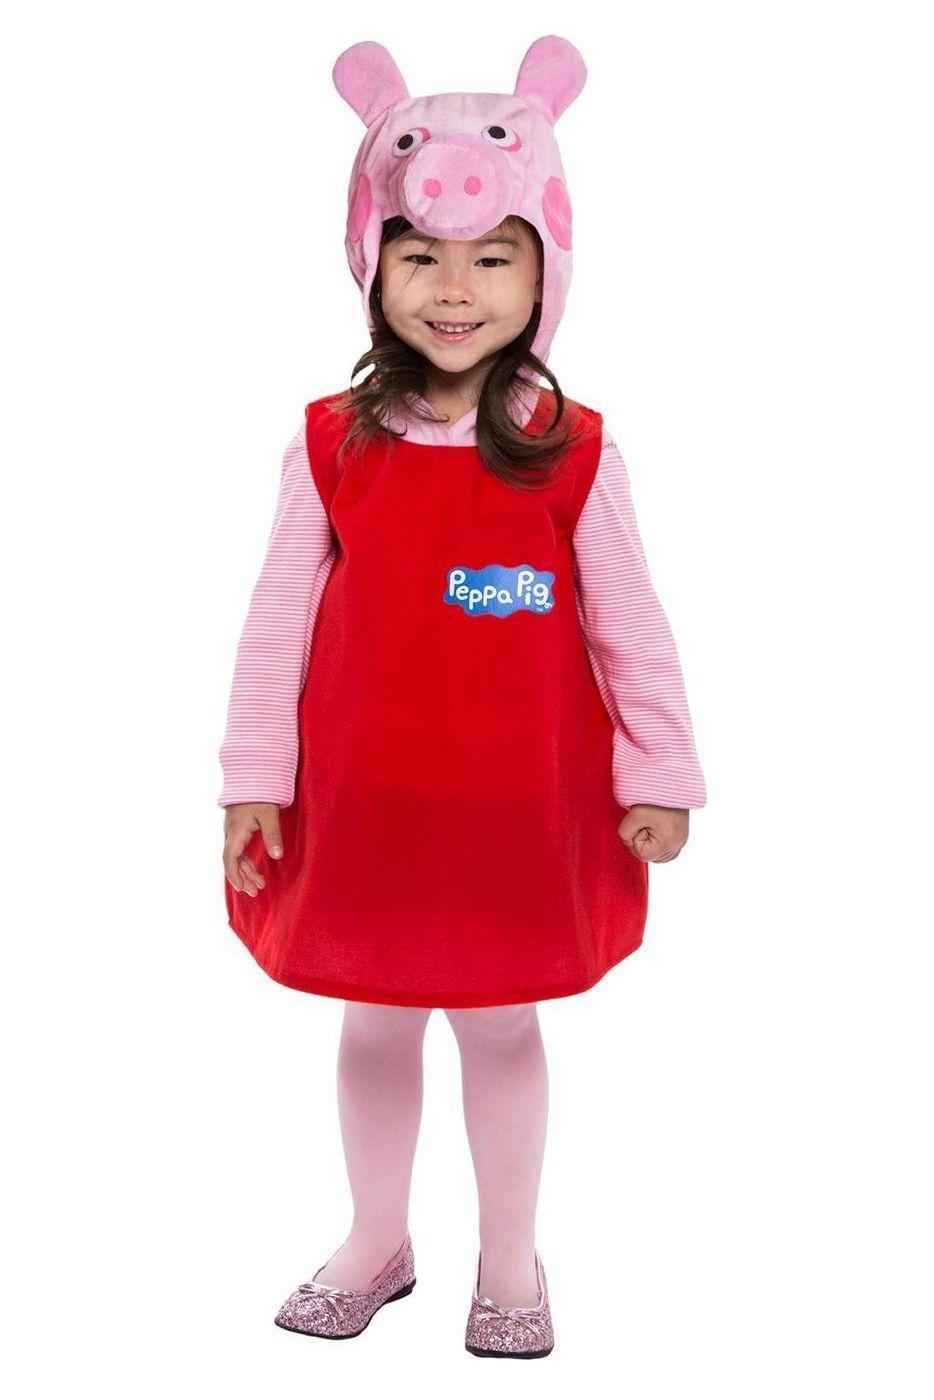 Wonderful 20 Best Toddler Halloween Costume Ideas 2018   Cute Halloween Costumes For  Infants